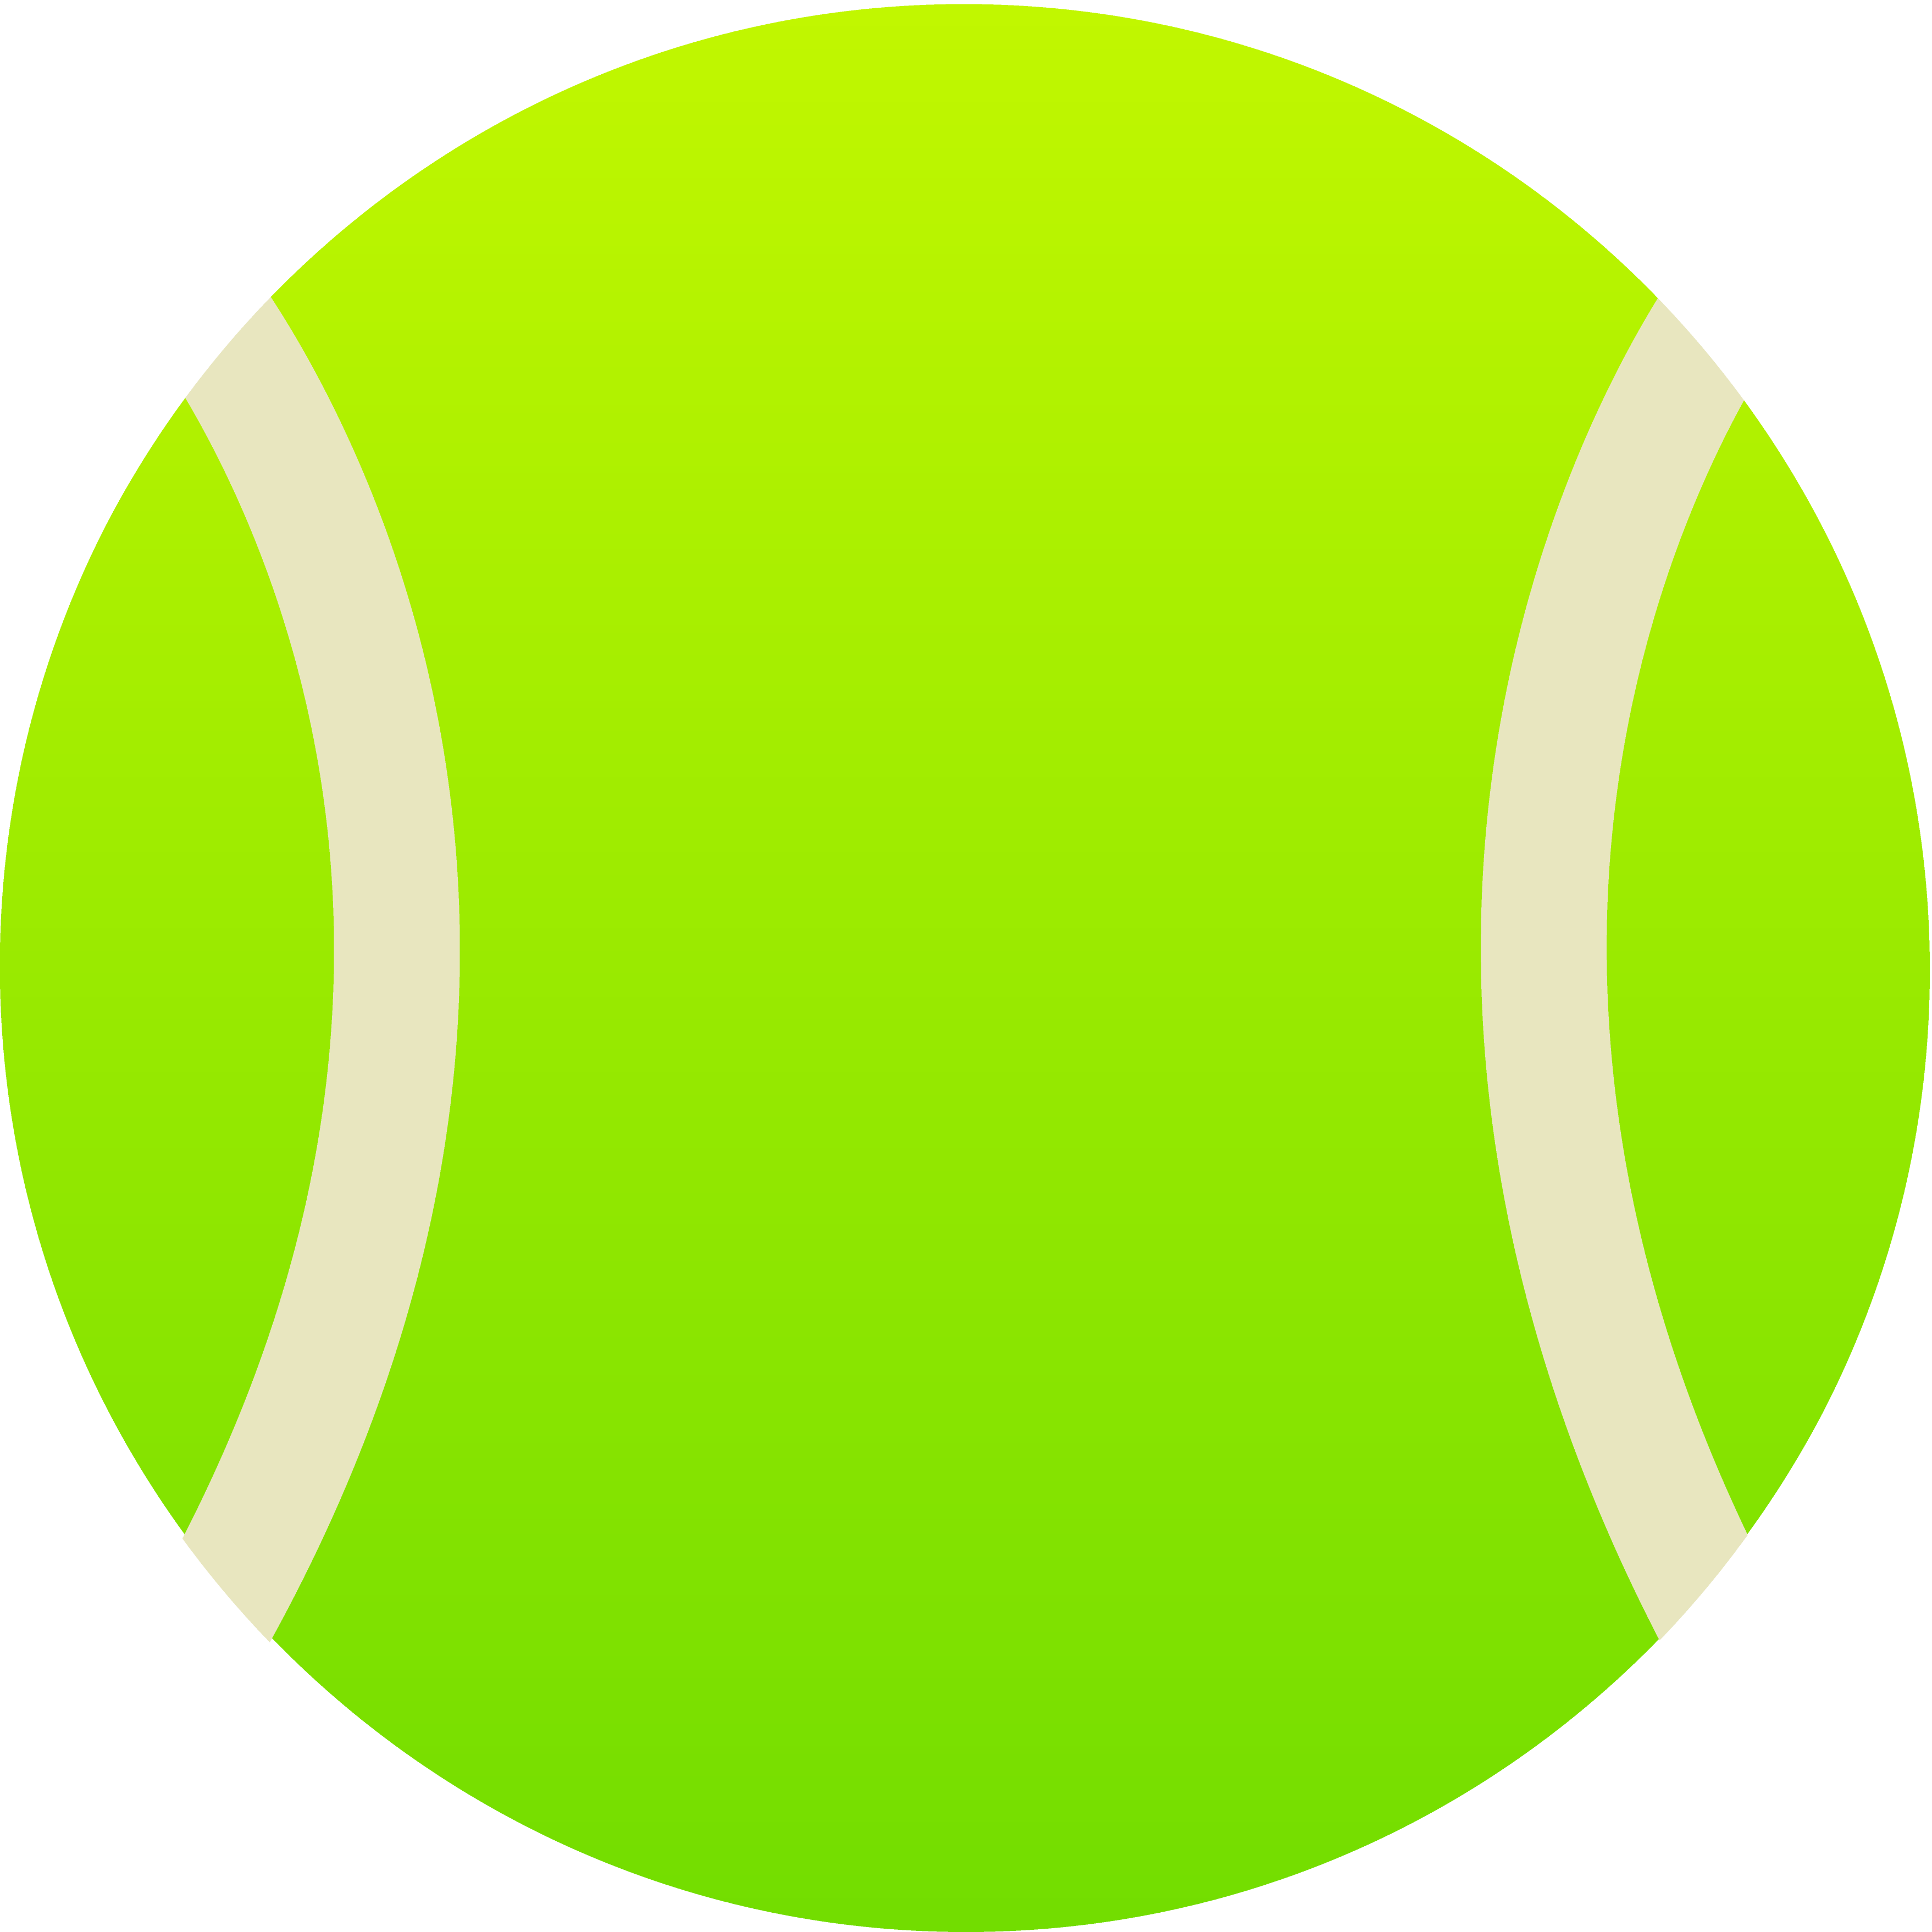 Ball clipart simple. Girl tennis panda free